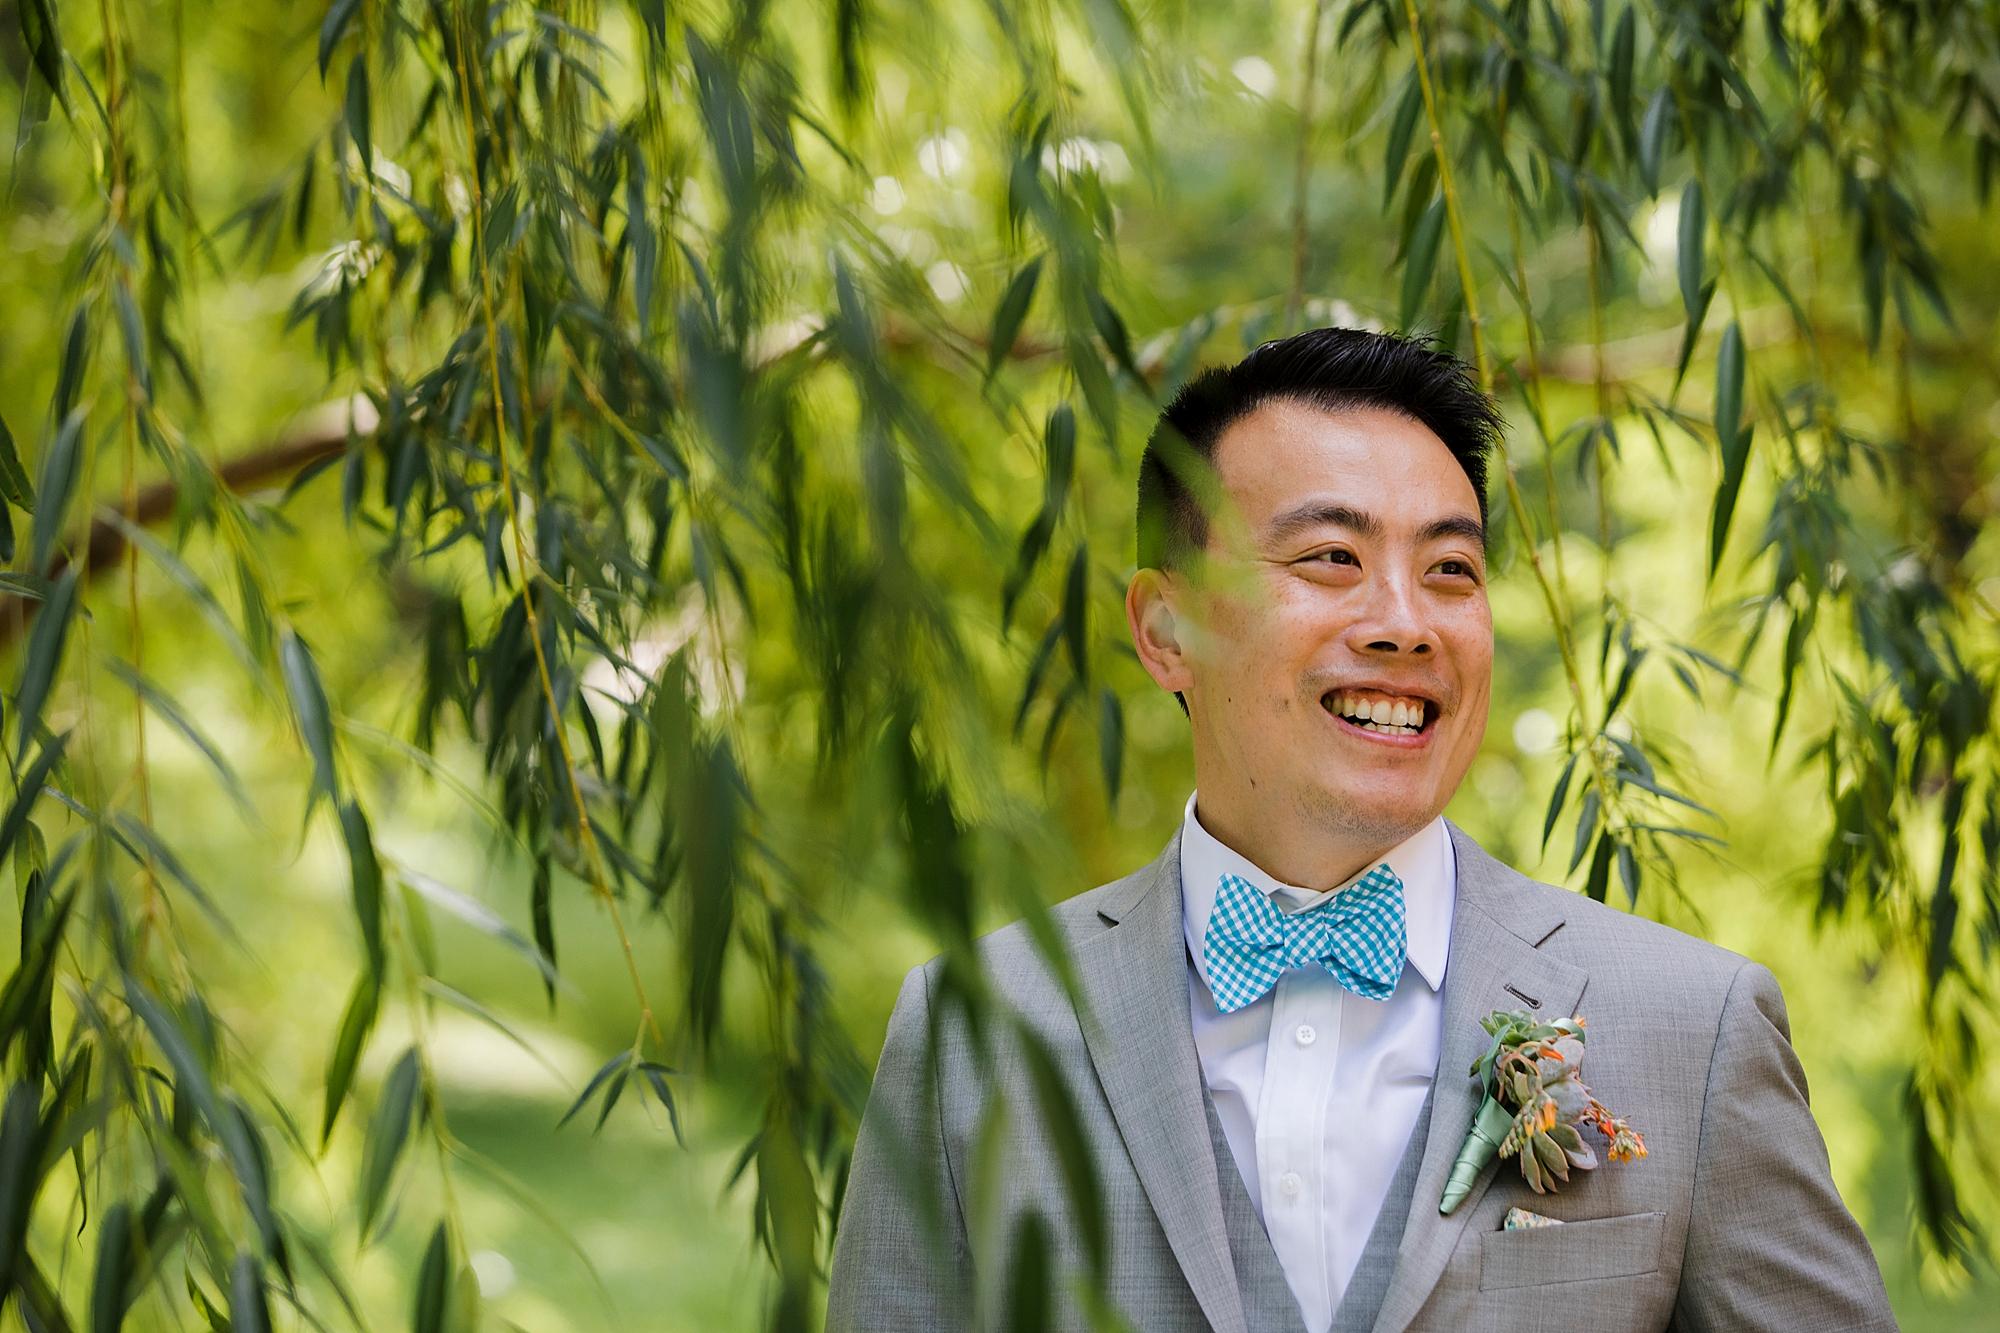 Dan_and_Byron_Love_by_Joe_Mac_Philadelphia_Wedding_LGBTQ_Photography_Gay_Independence_visitor_Center_51.JPG